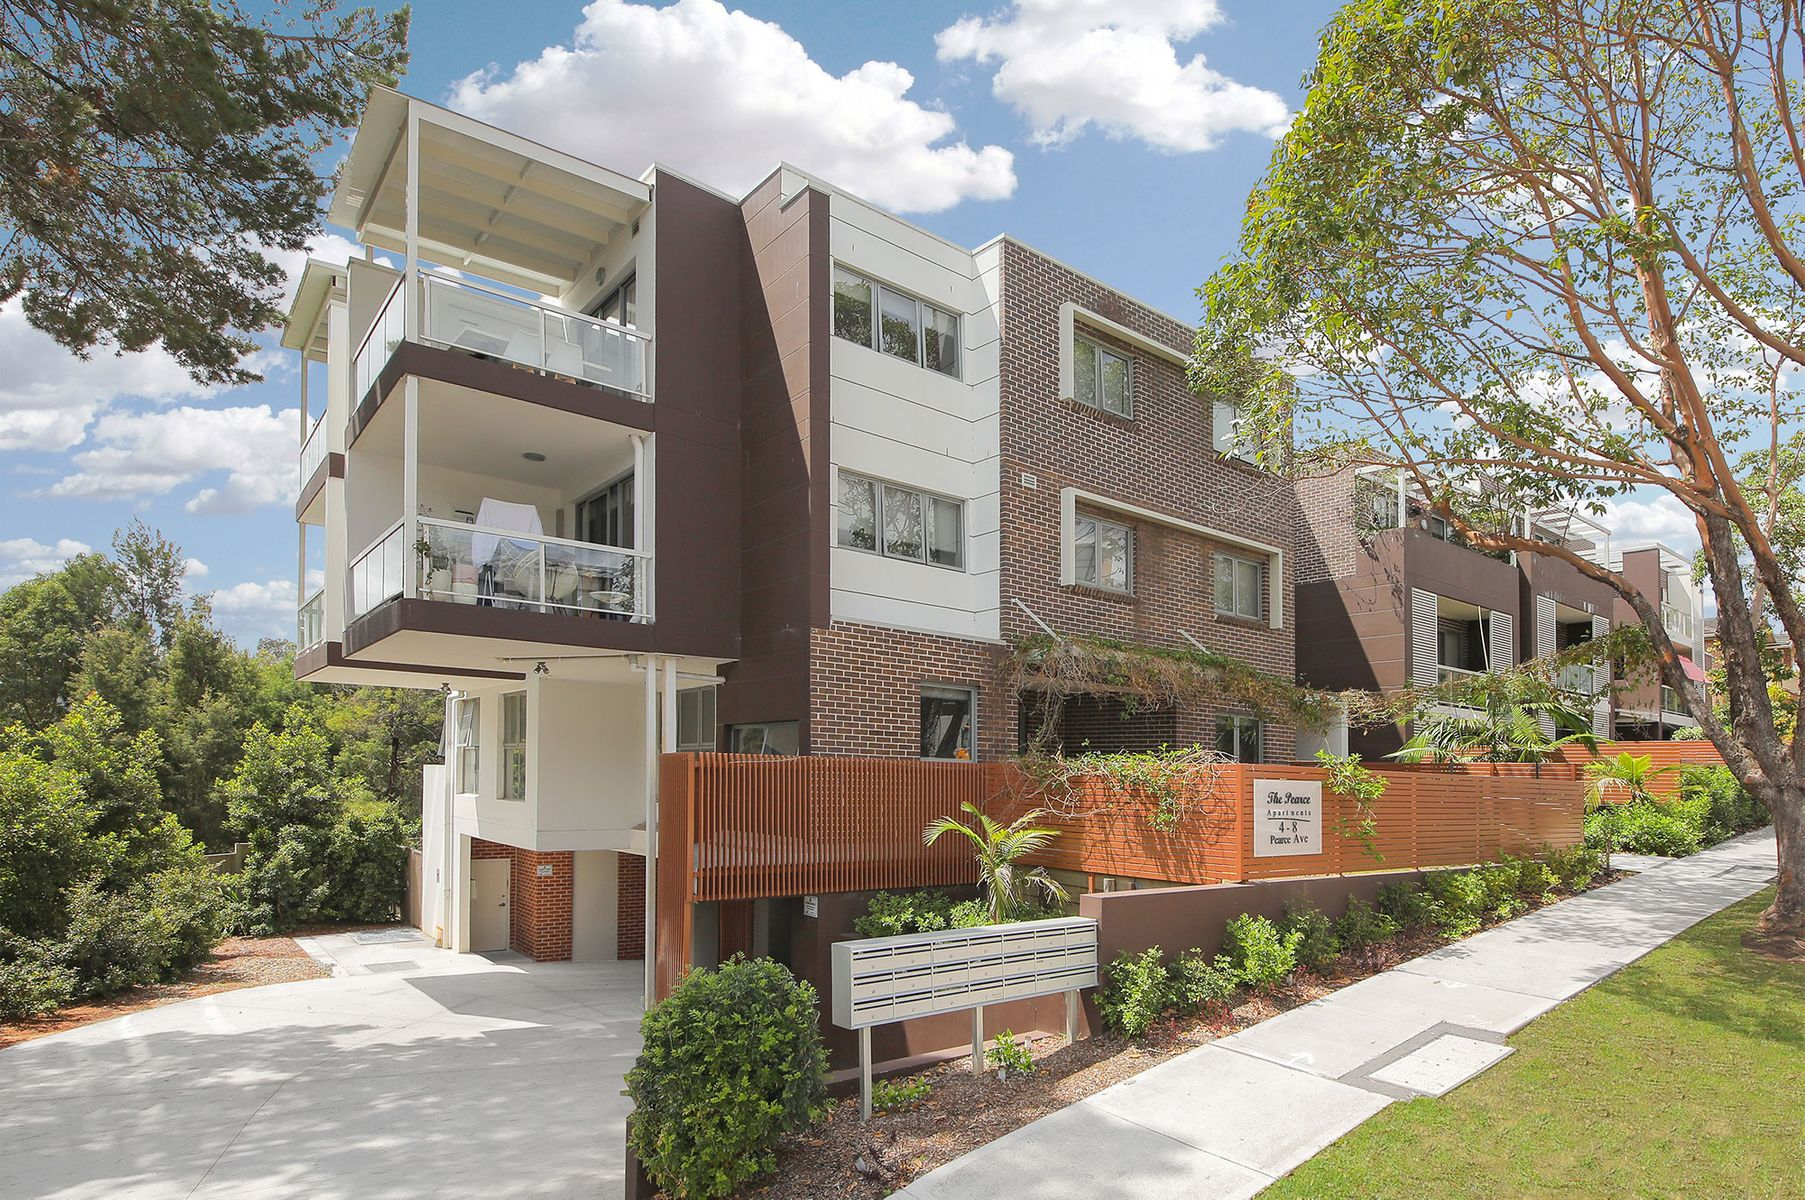 13/4-8 Pearce Avenue, Peakhurst, NSW 2210